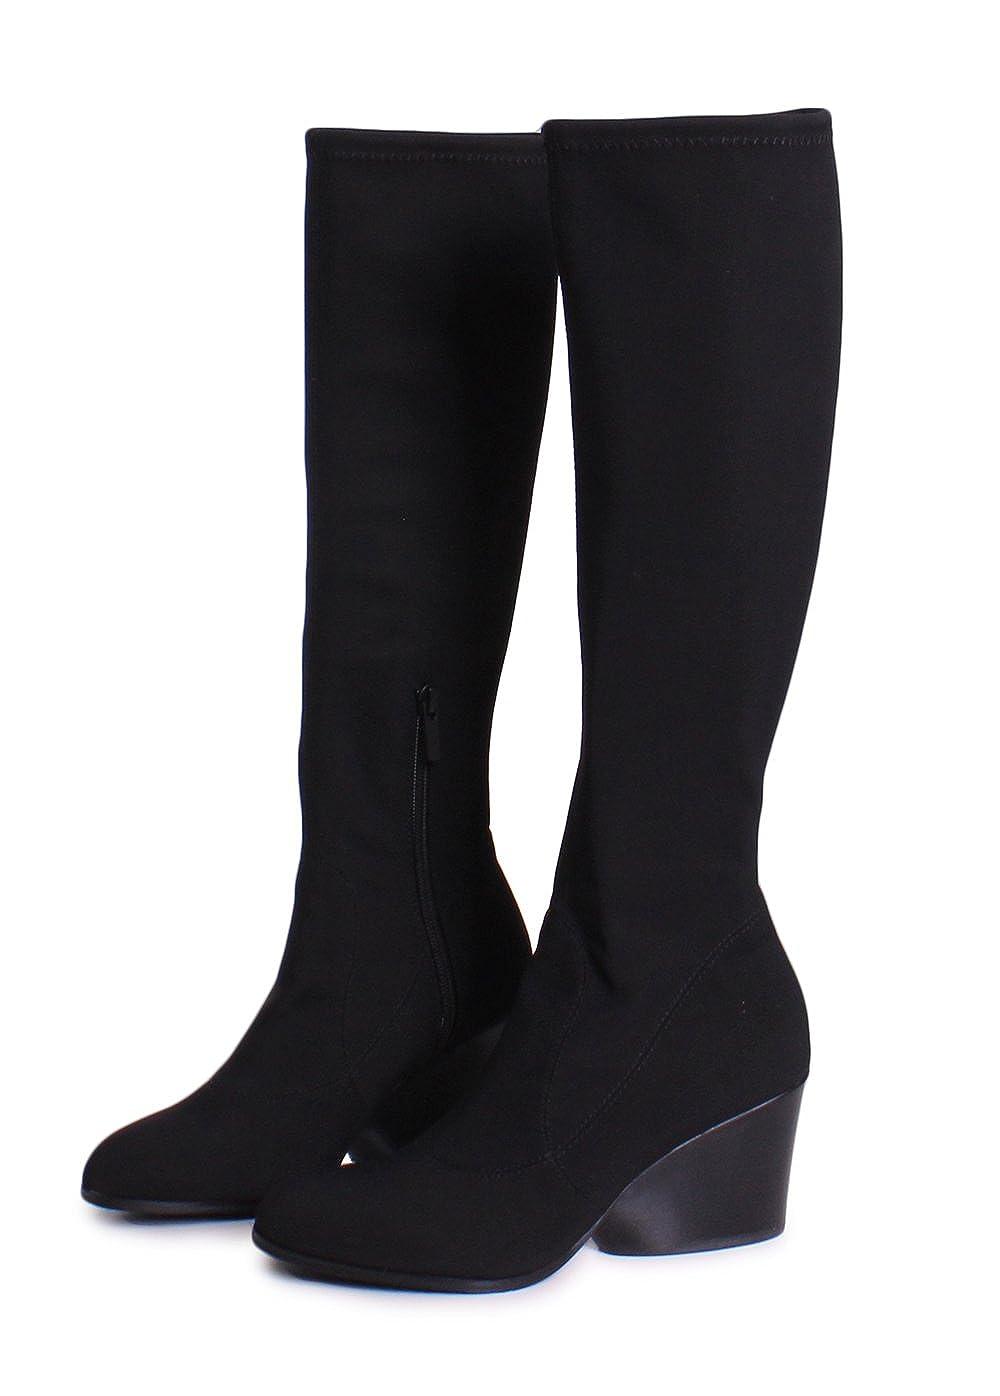 Donald J Pliner Patsy Crepe Elastic Knee High Boots In Black B077V238KM 6 B(M) US